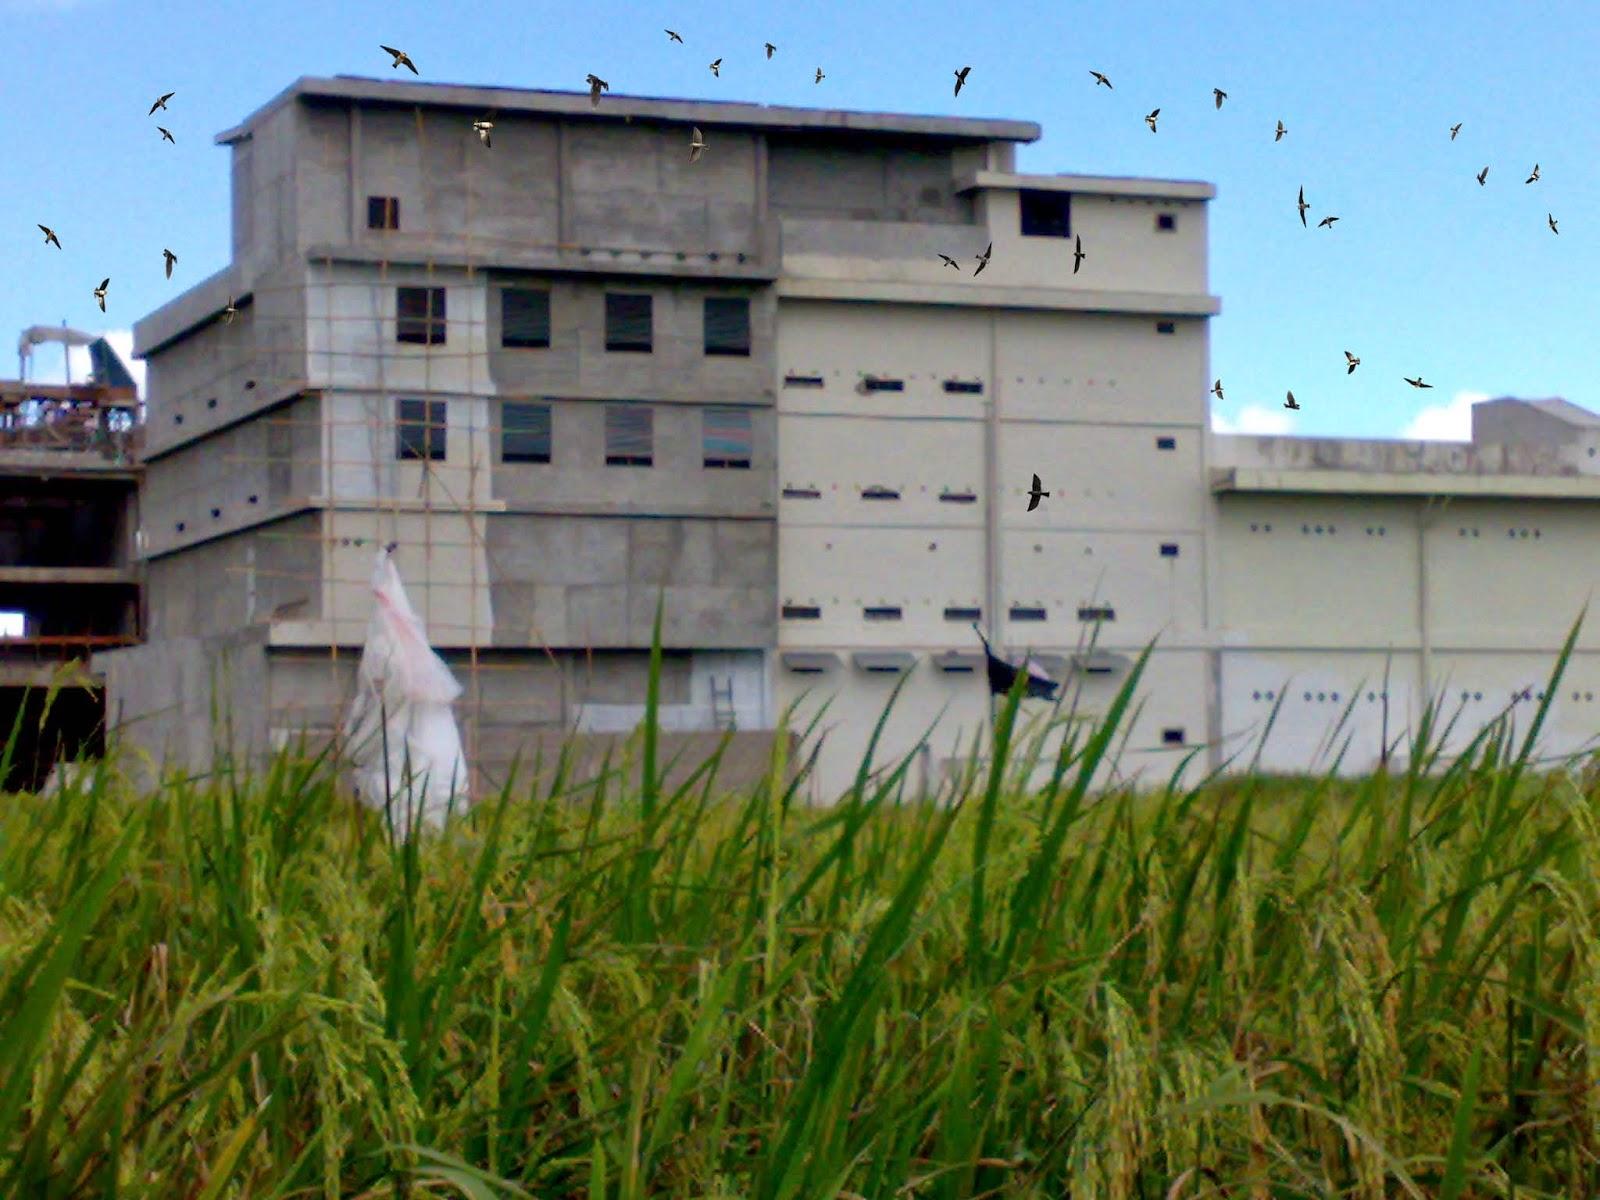 Kumpulan Gambar Rumah Walet Burung Walet Kalimantan